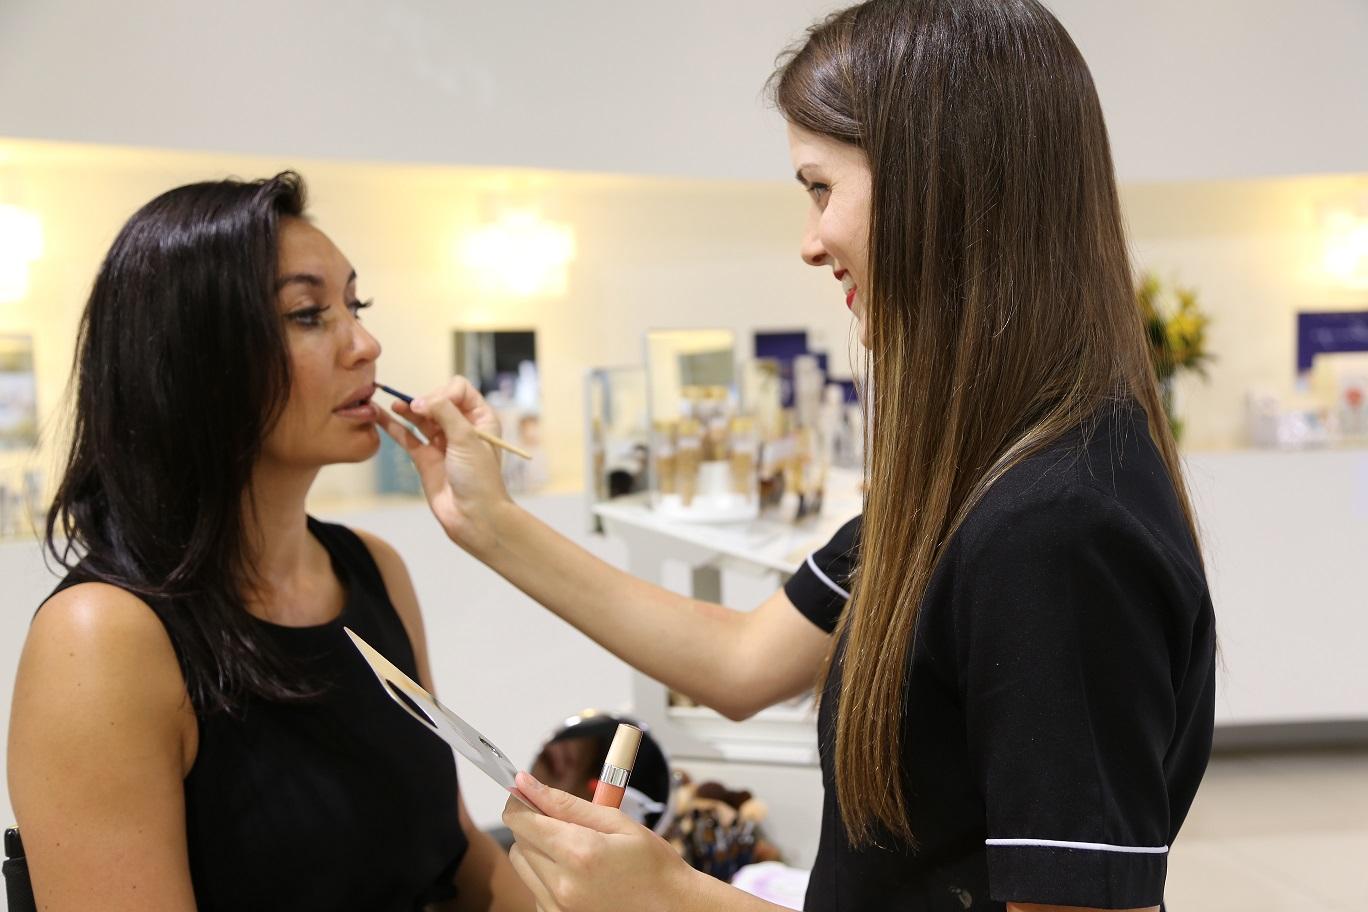 ottawa-gatineau makeup courses | michael boychuck online hair academy